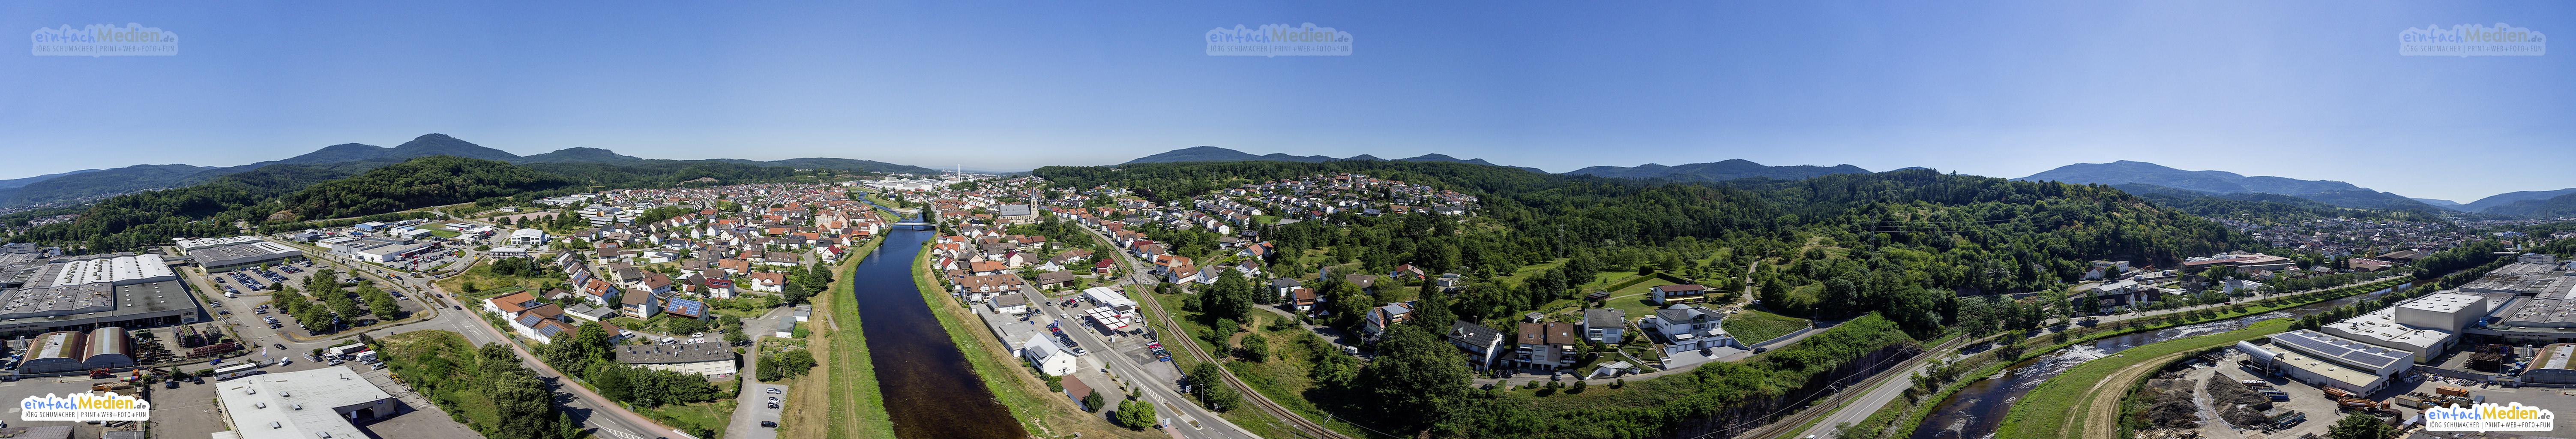 Gaggenau Ottenau - Höhe Bengali - 360°-Luftbild-Panorama